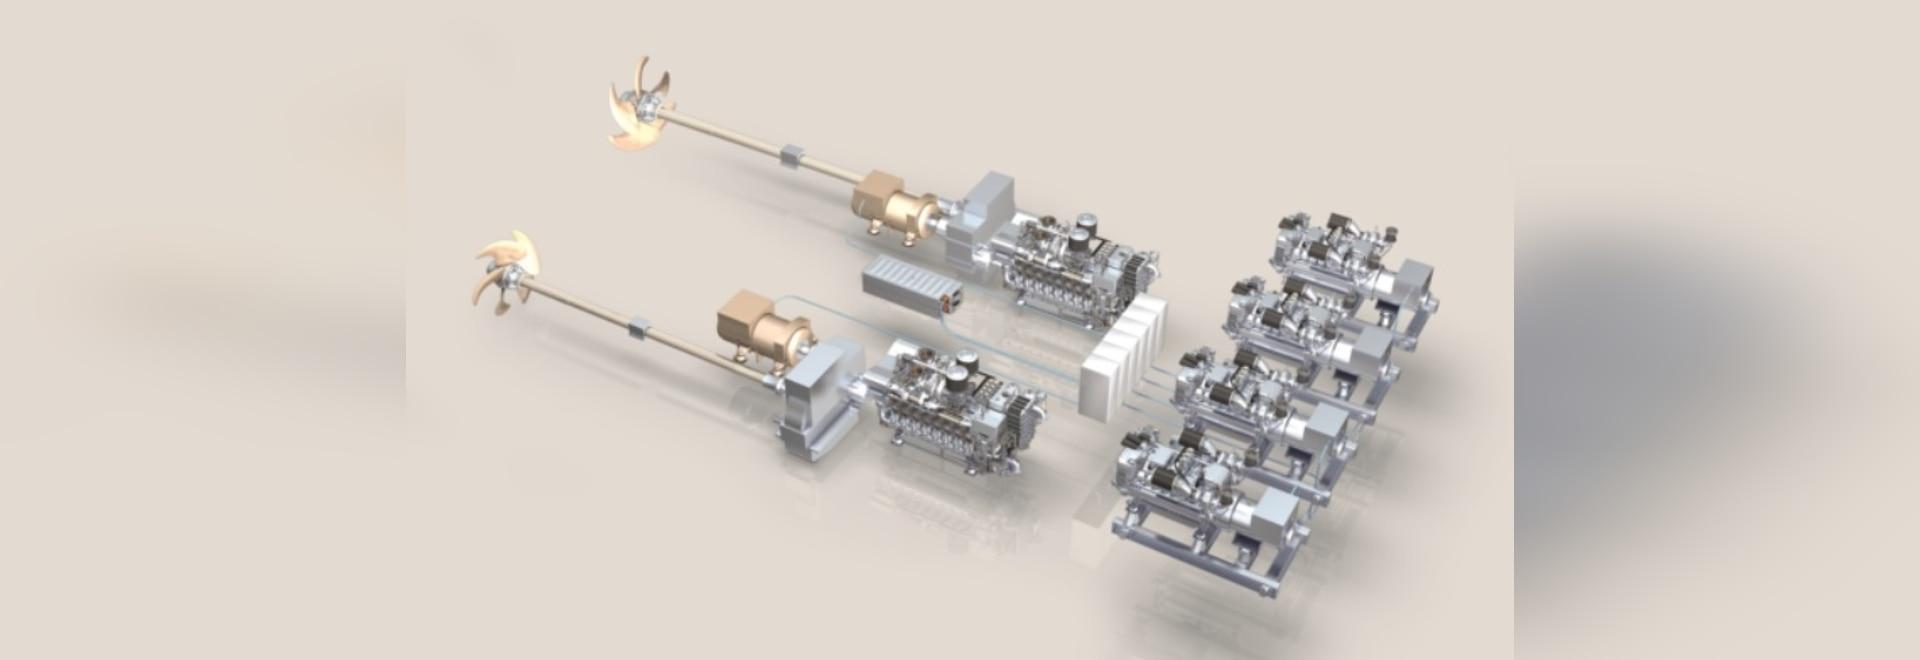 MTU hybrid propulsion - Germany